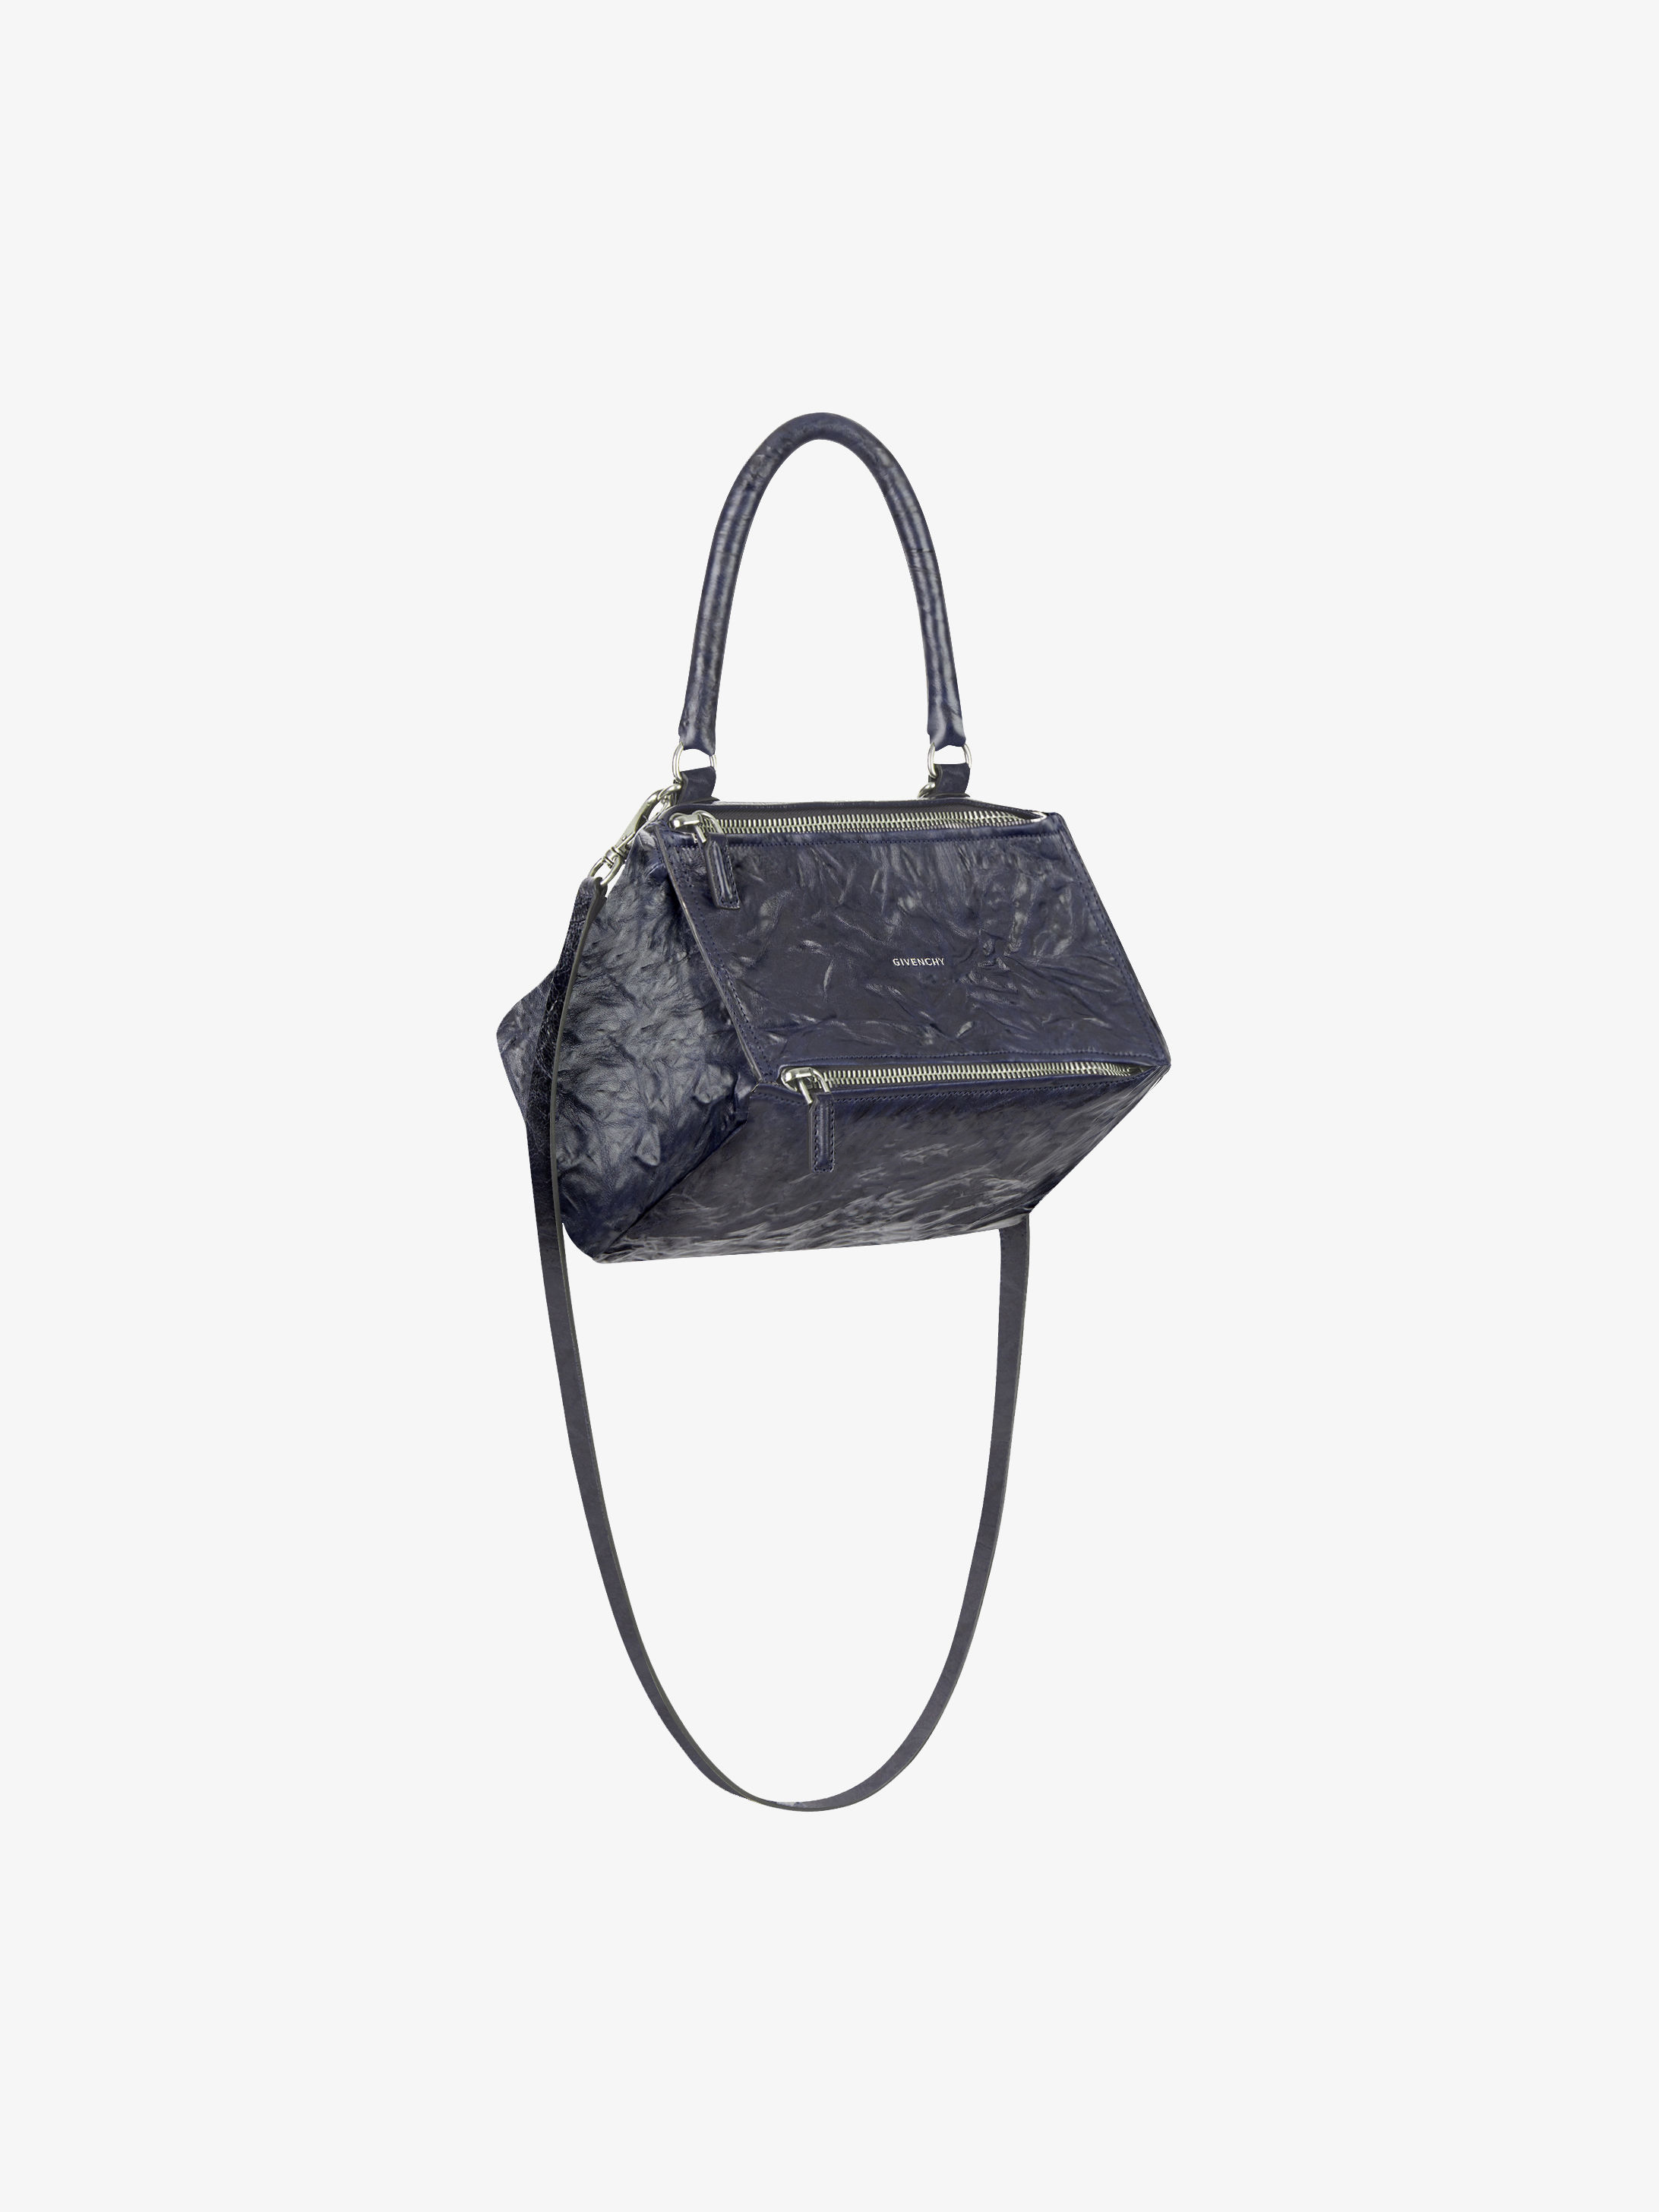 Medium Pandora bag in aged leather